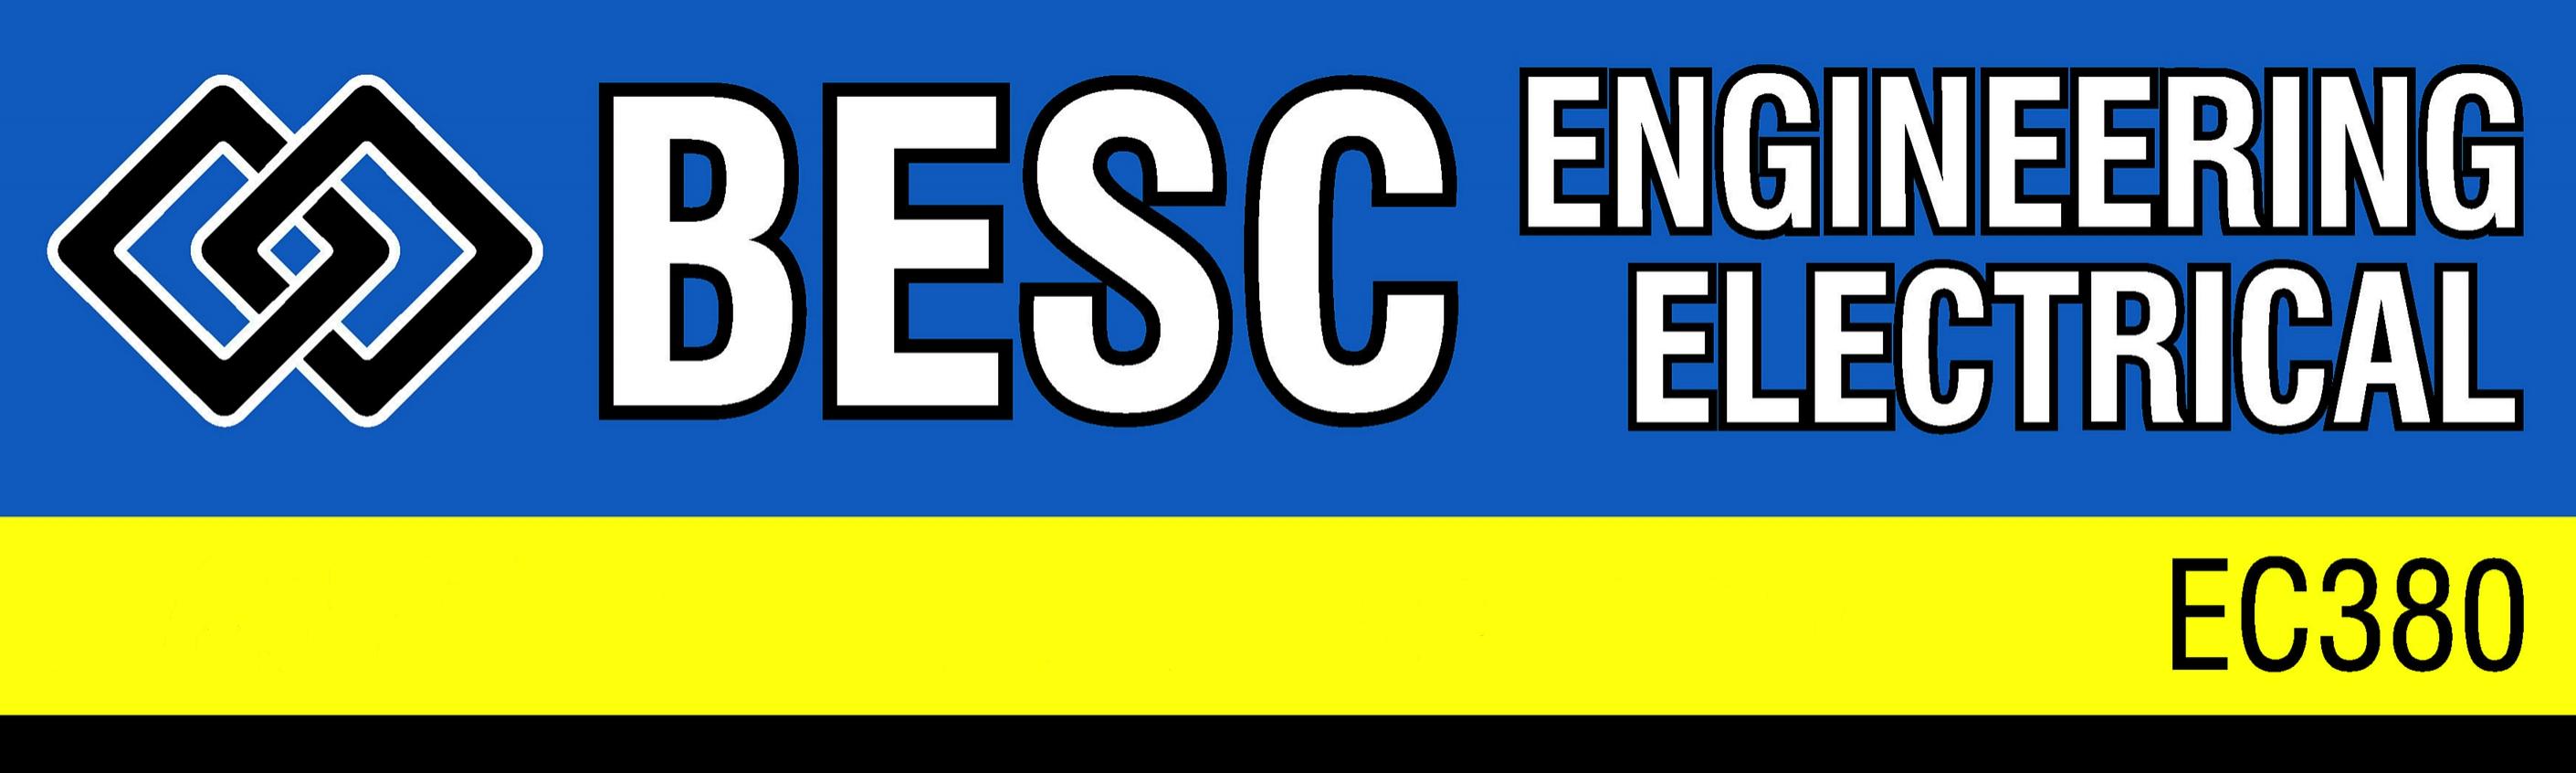 BESC-416410-edited